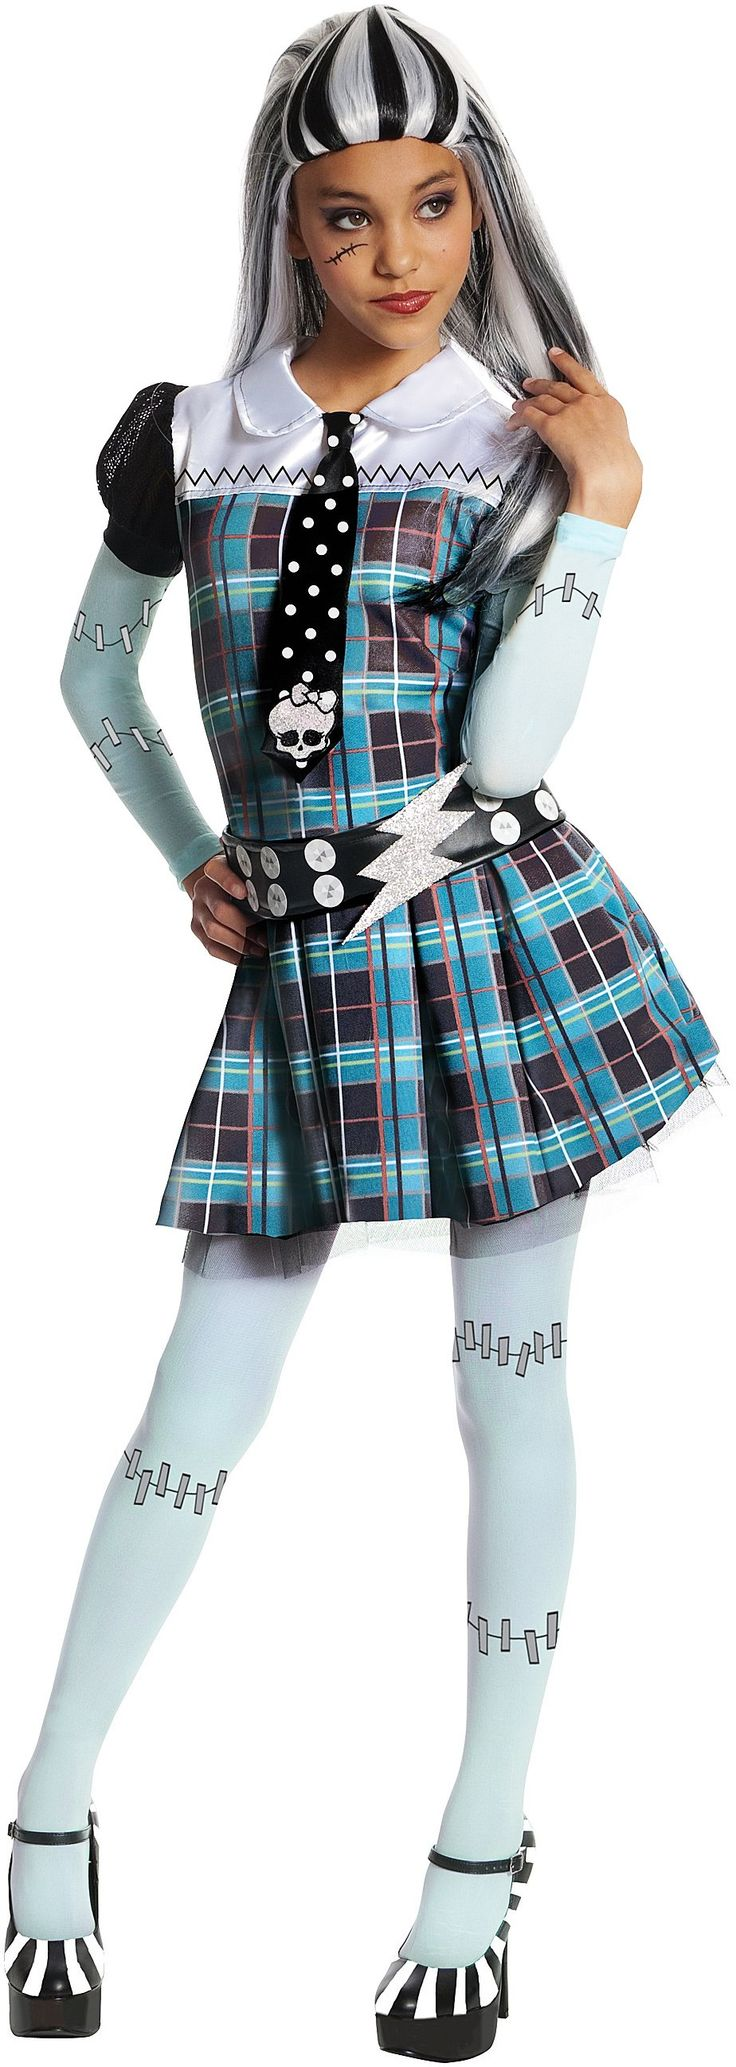 $36.95 + $9.95 Shipping ++ $18.95 for Wig Children's Monster High Frankie Stein Costume